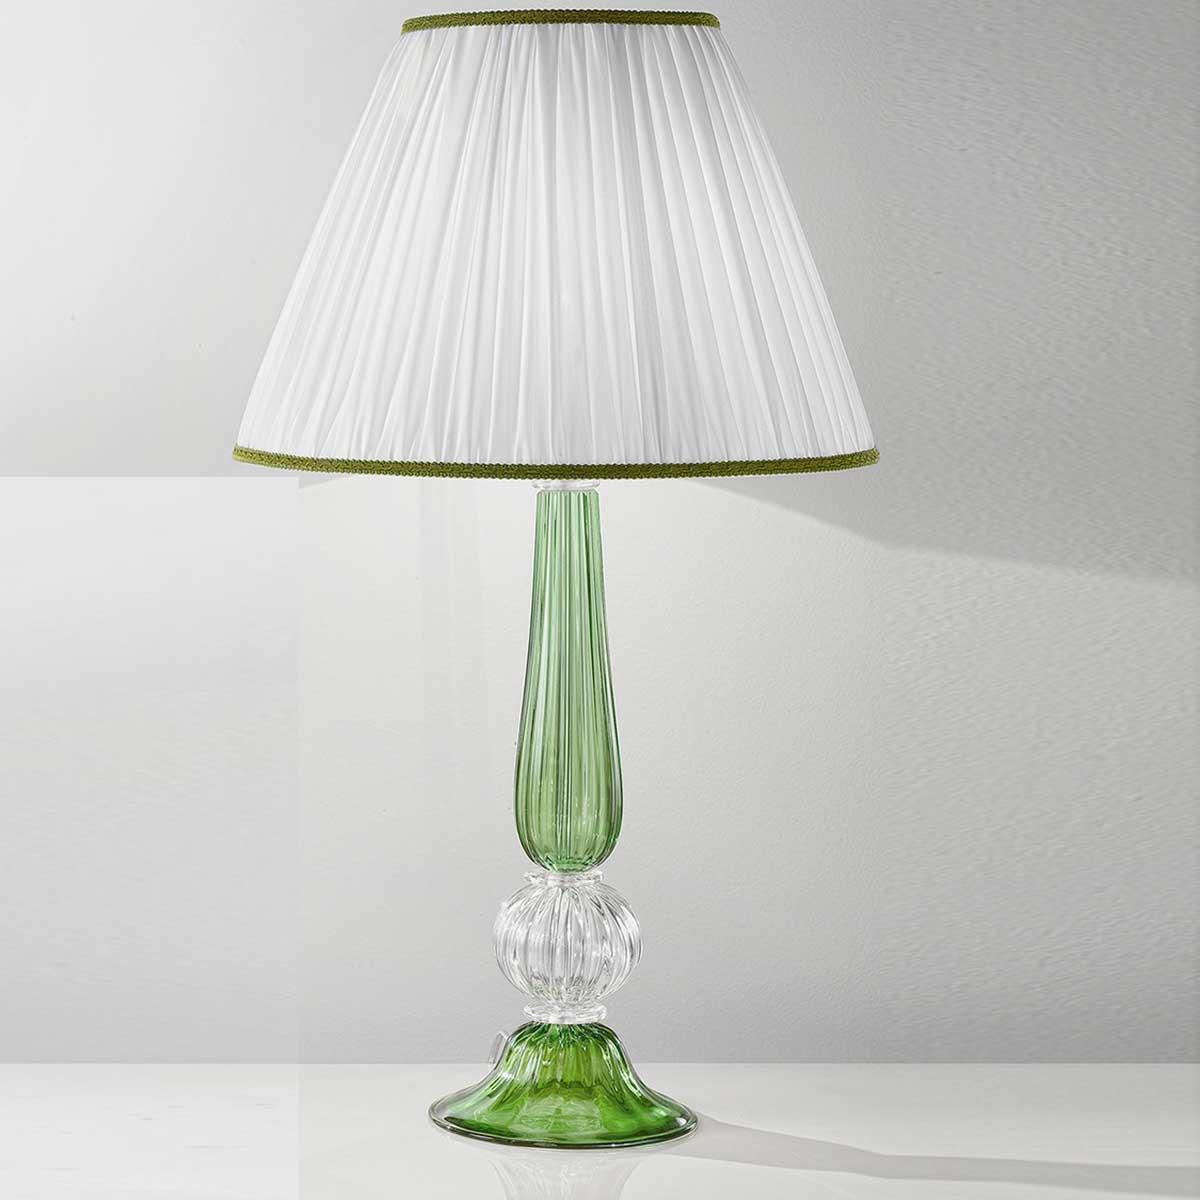 """Raffaella"" lampe de table en verre de Murano - 1 lumière - vert"